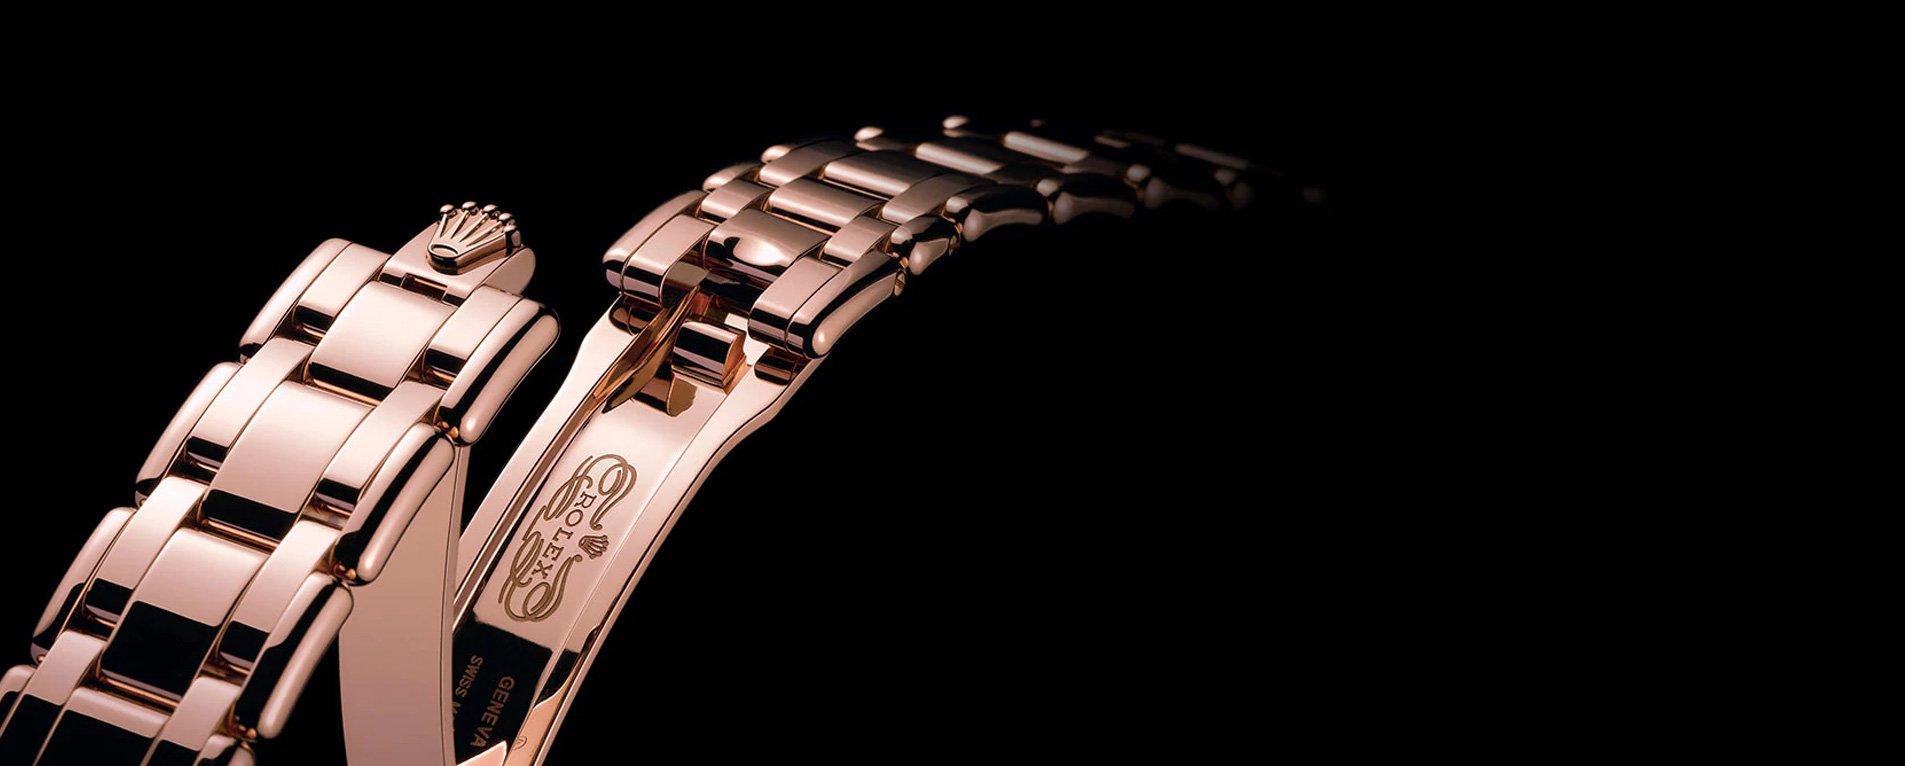 Rolex Bracelets